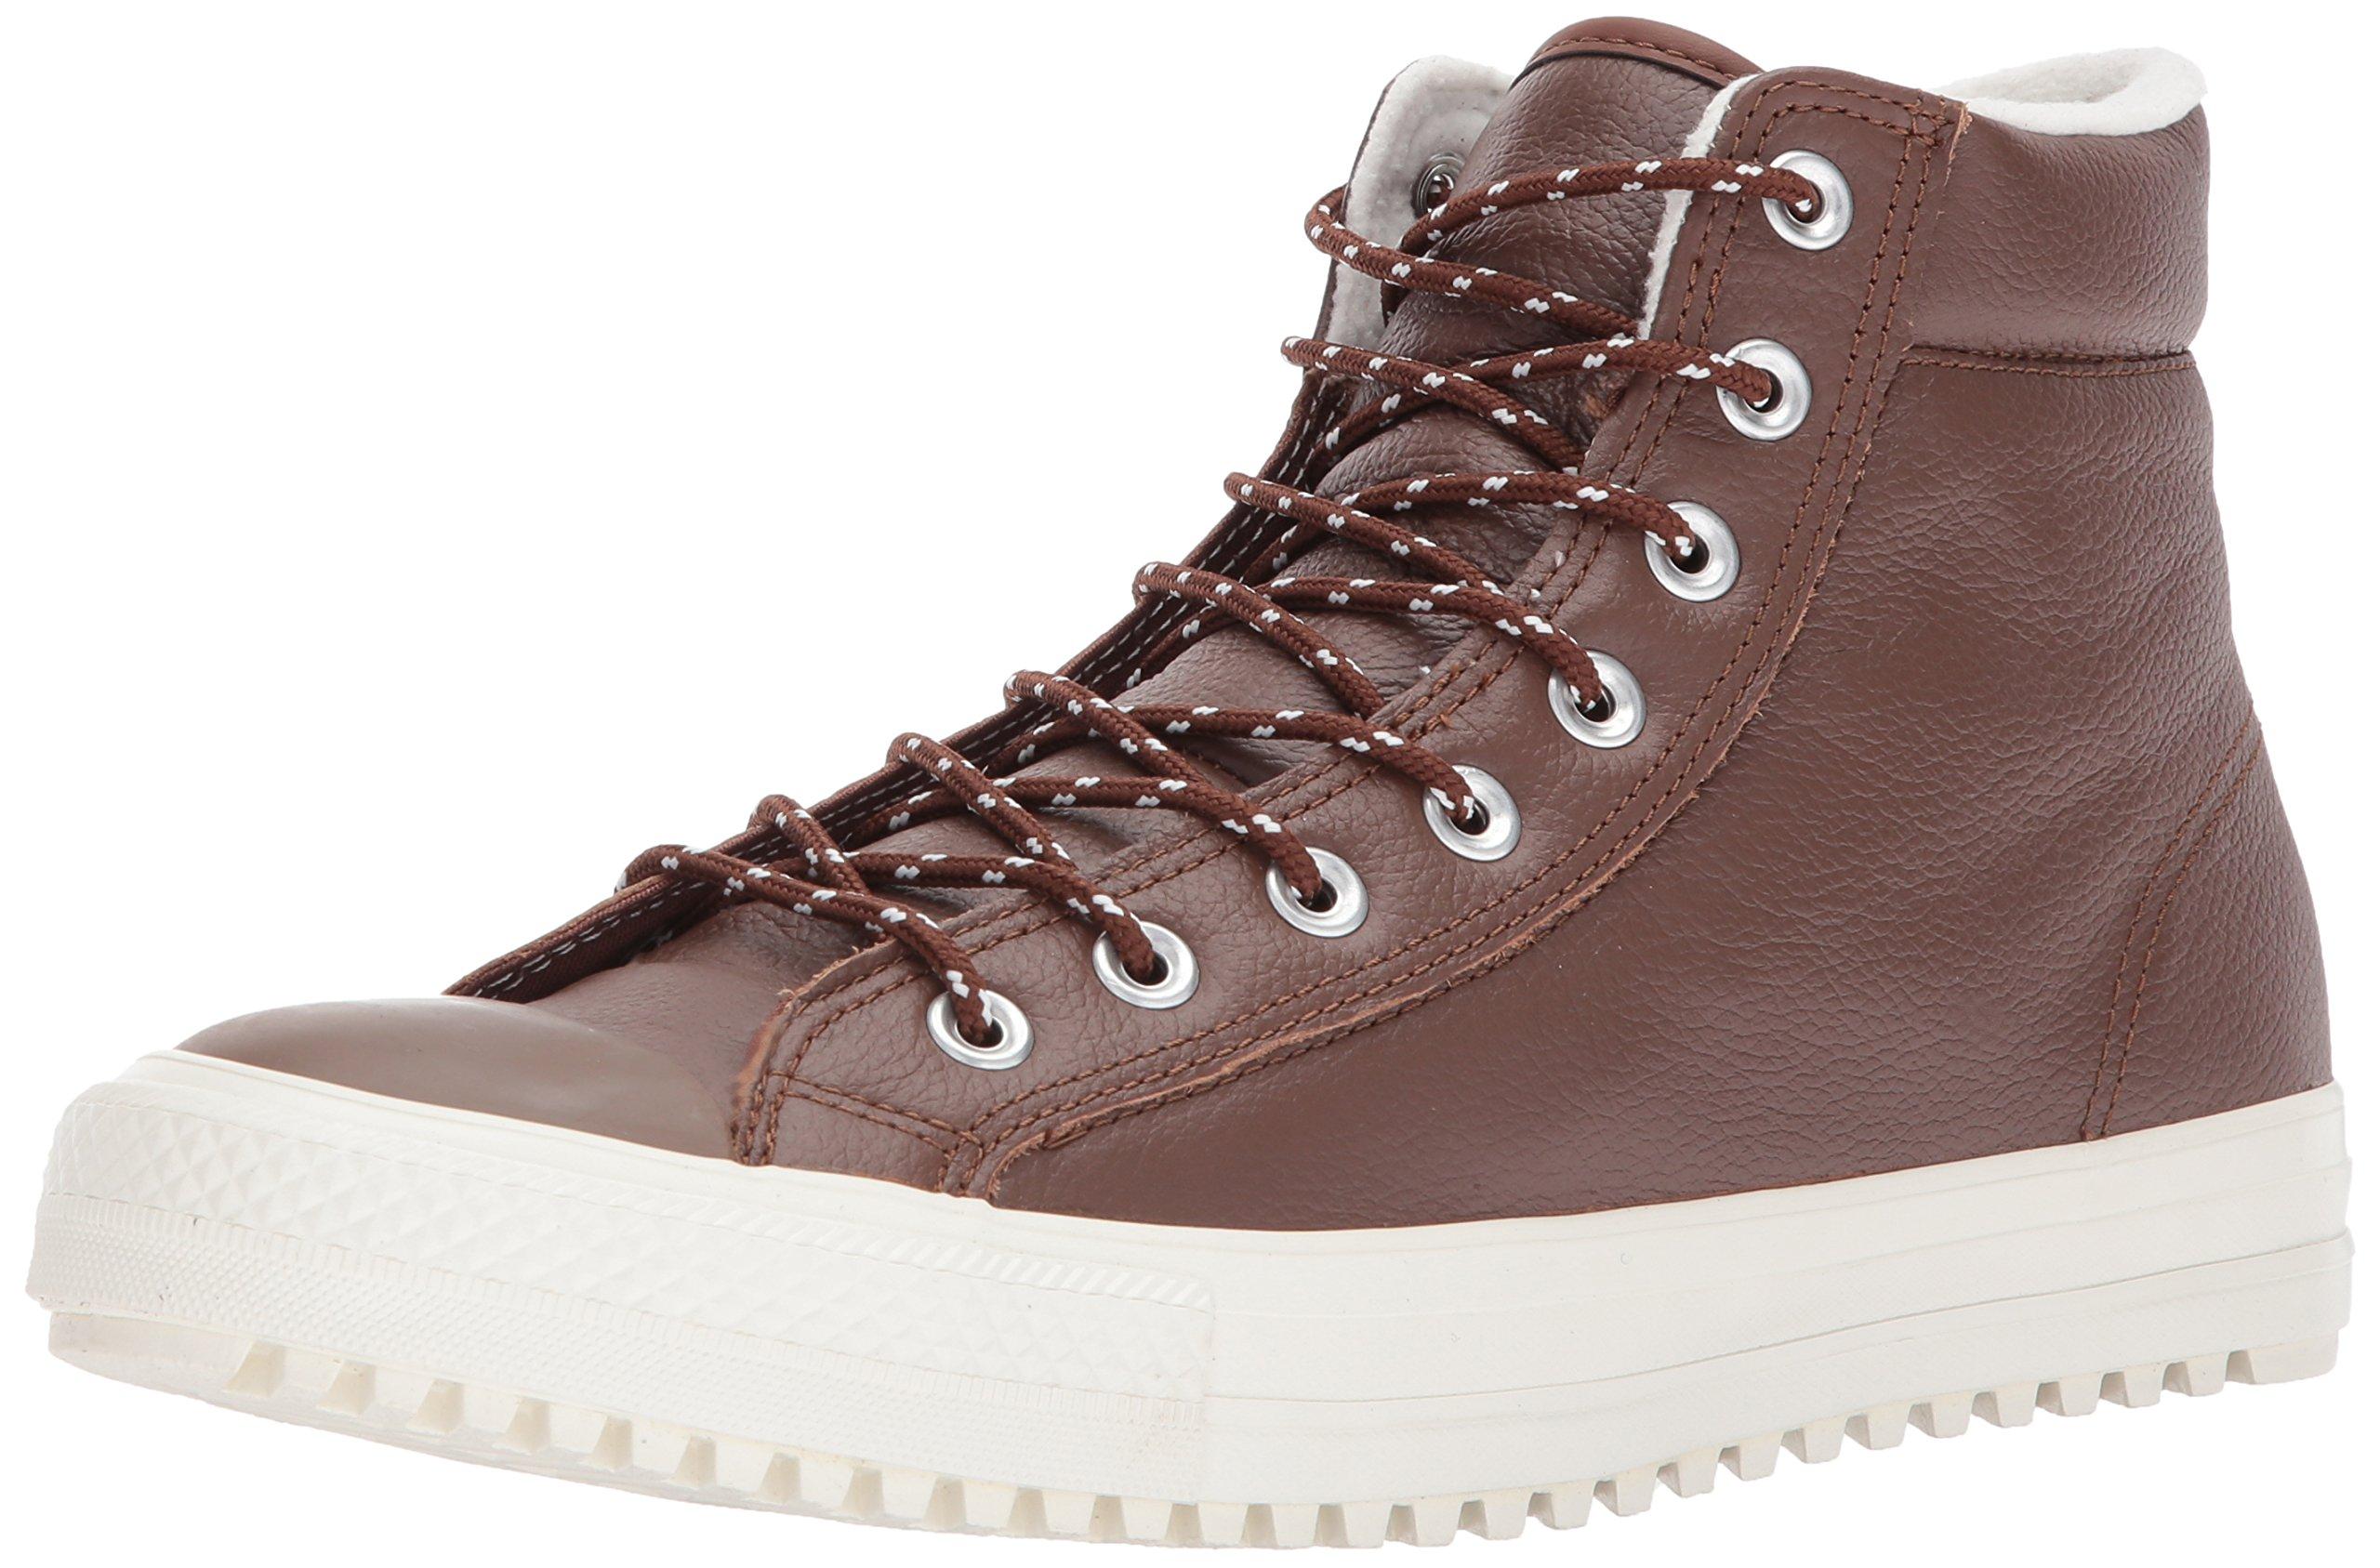 Converse Unisex Chuck Taylor Boot PC Tumbled Leather Dark Clove/Dark Clove/Egret Sneaker - 10 Men - 12 Women